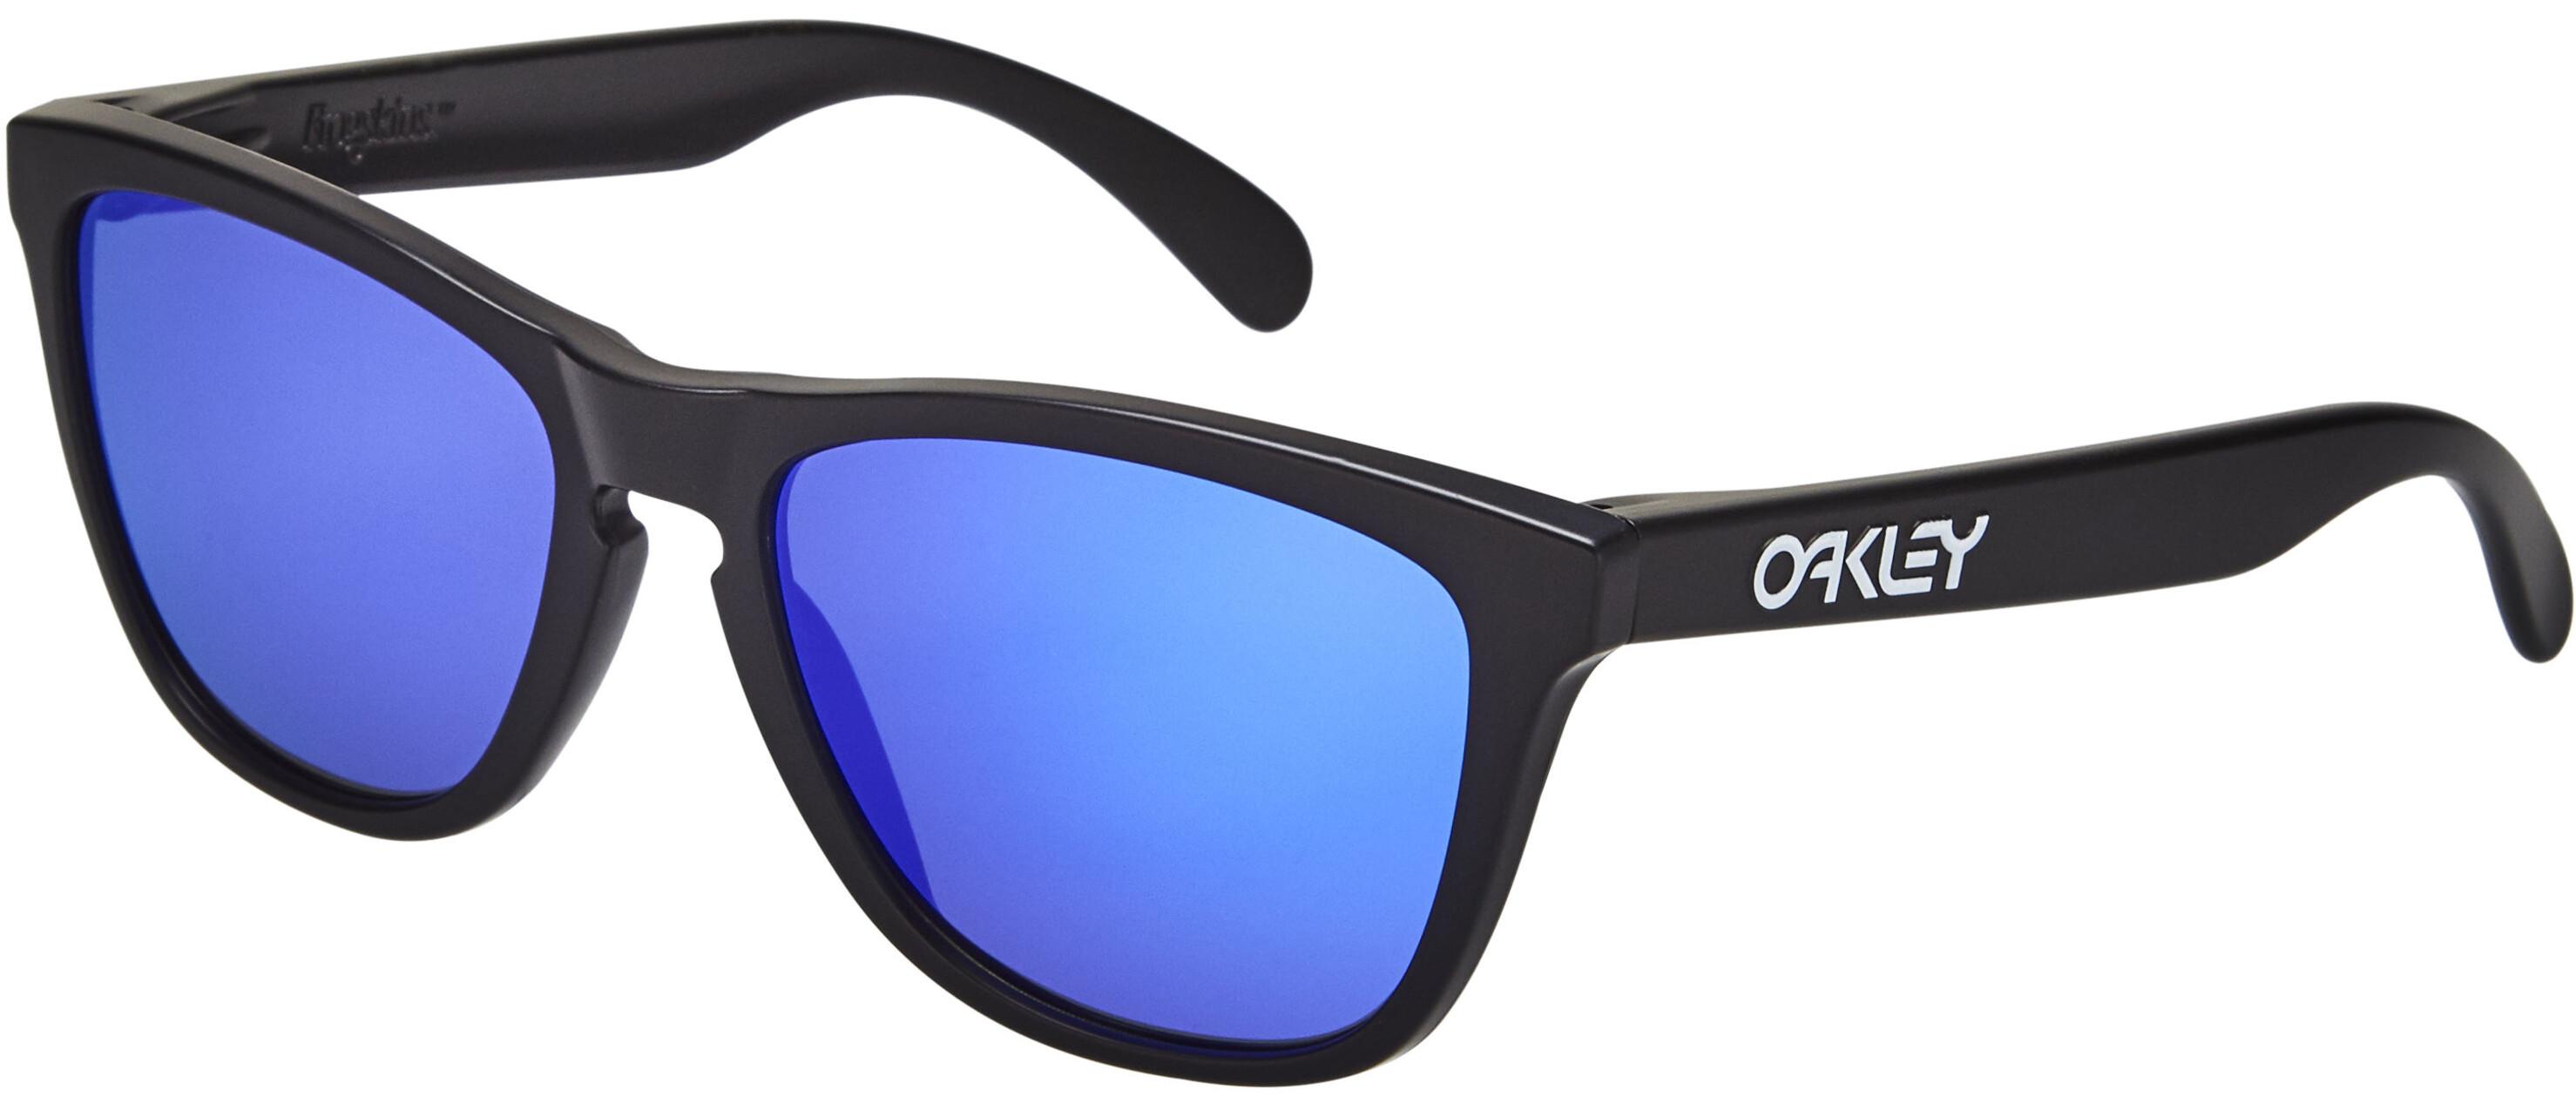 182f3eddae Oakley Frogskins - Gafas ciclismo - negro | Bikester.es